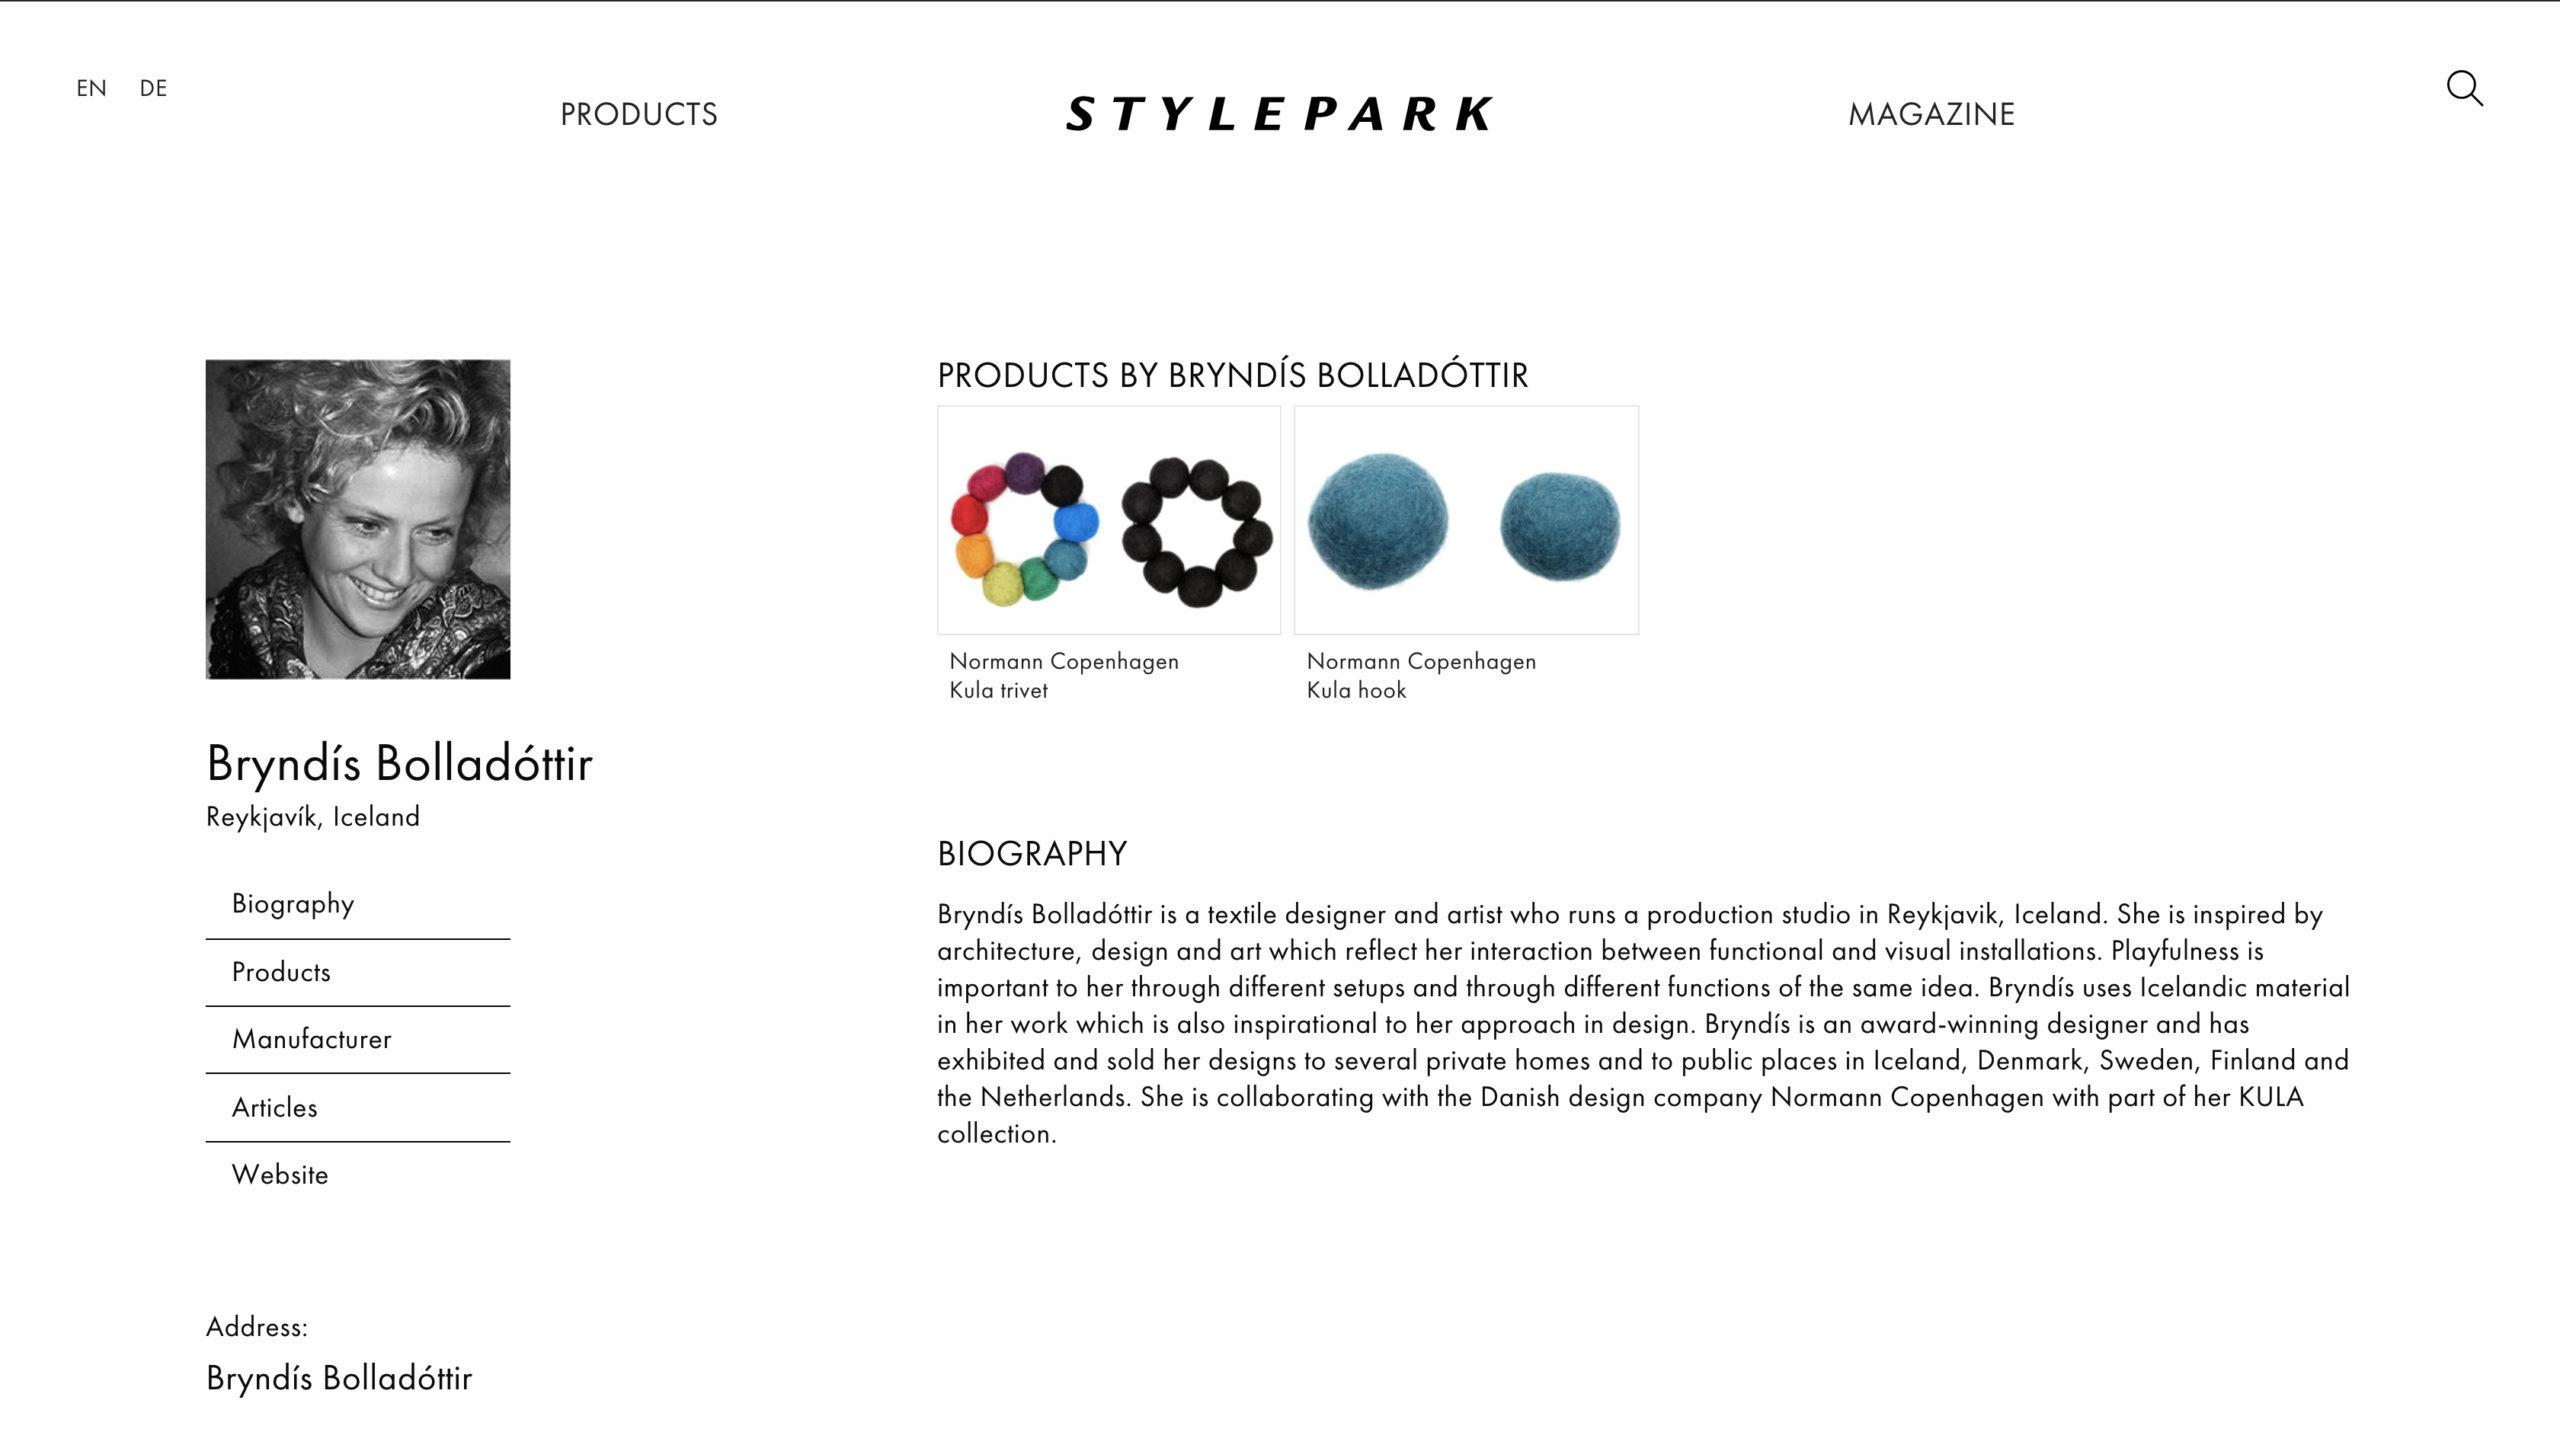 https://www.stylepark.com/en/designer/bryndis-bolladottir